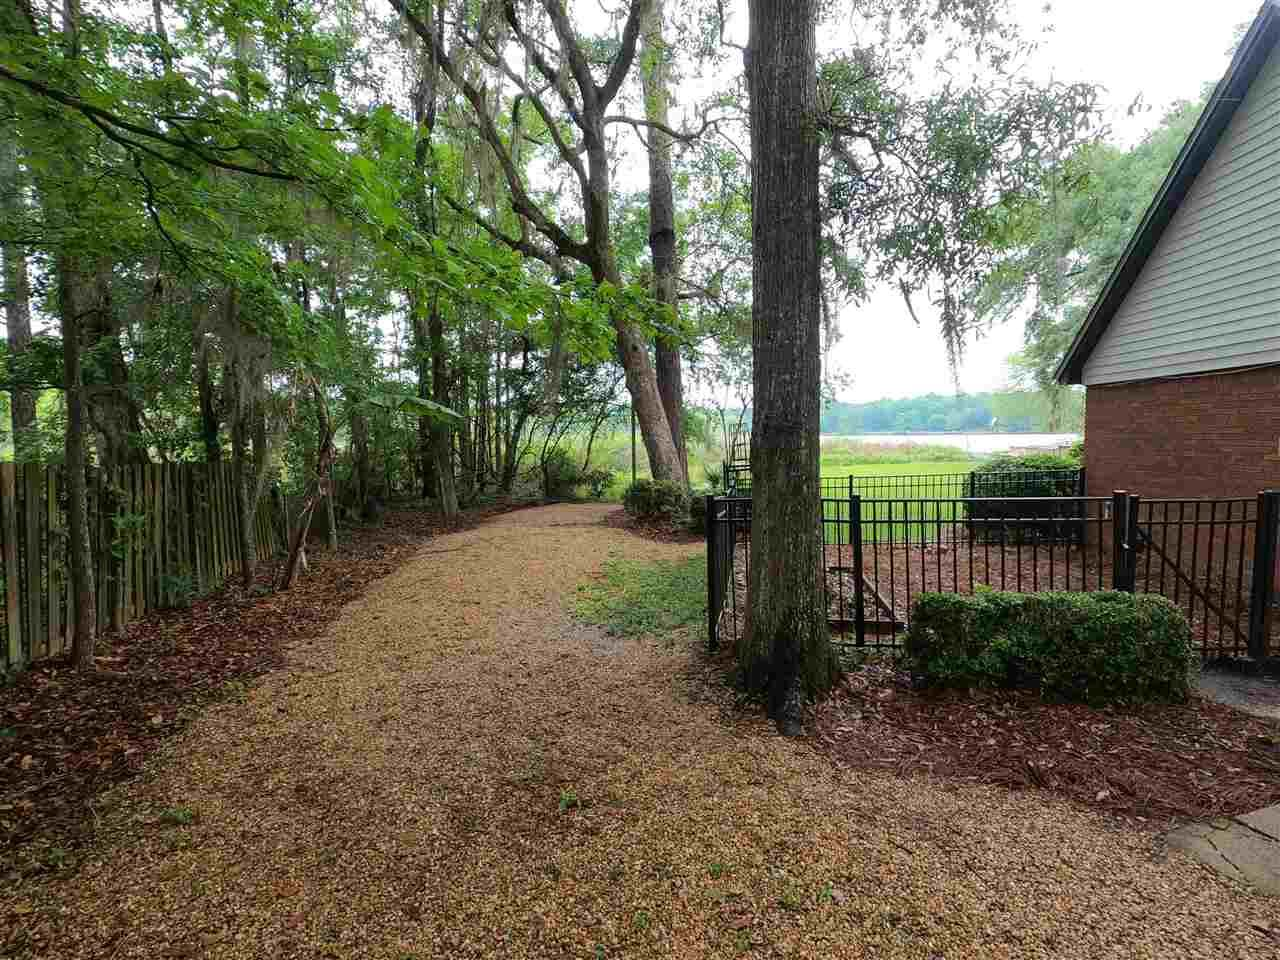 Photo of 3908 Wood Green Way, TALLAHASSEE, FL 32309 (MLS # 331671)